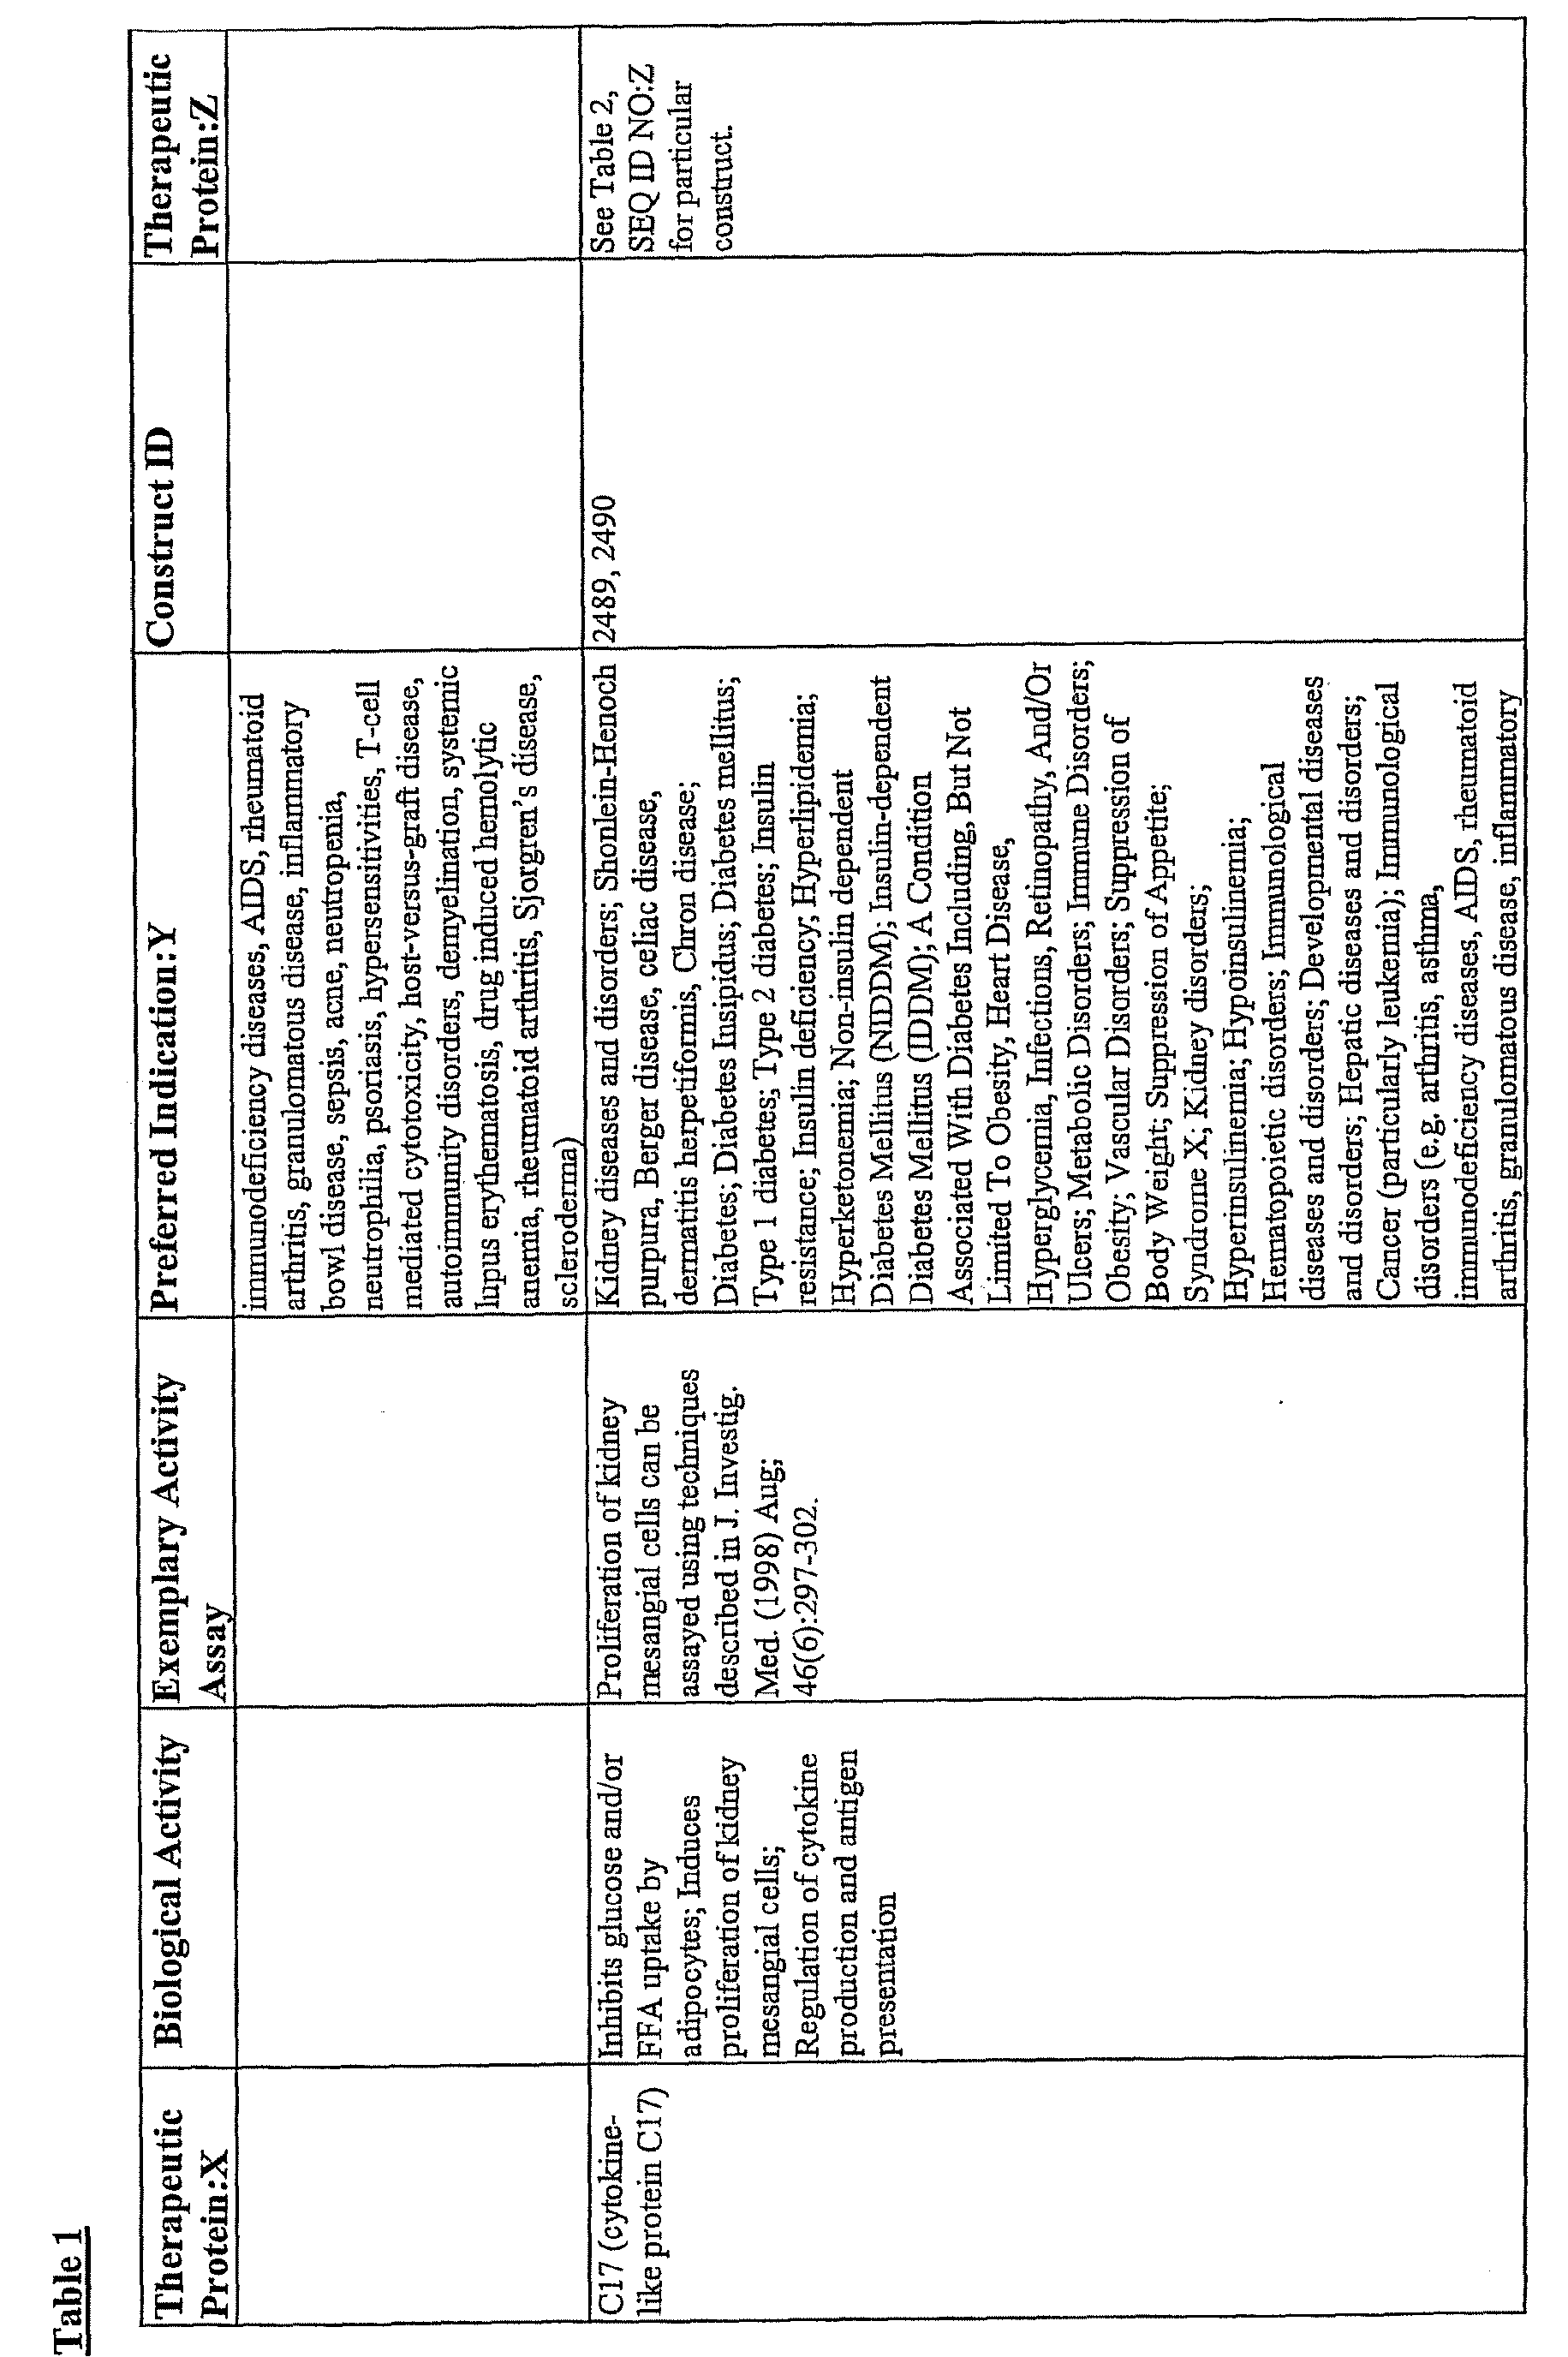 Best Prohormone 2020 EP2990417A1   Albumin insulin fusion protein   Google Patents